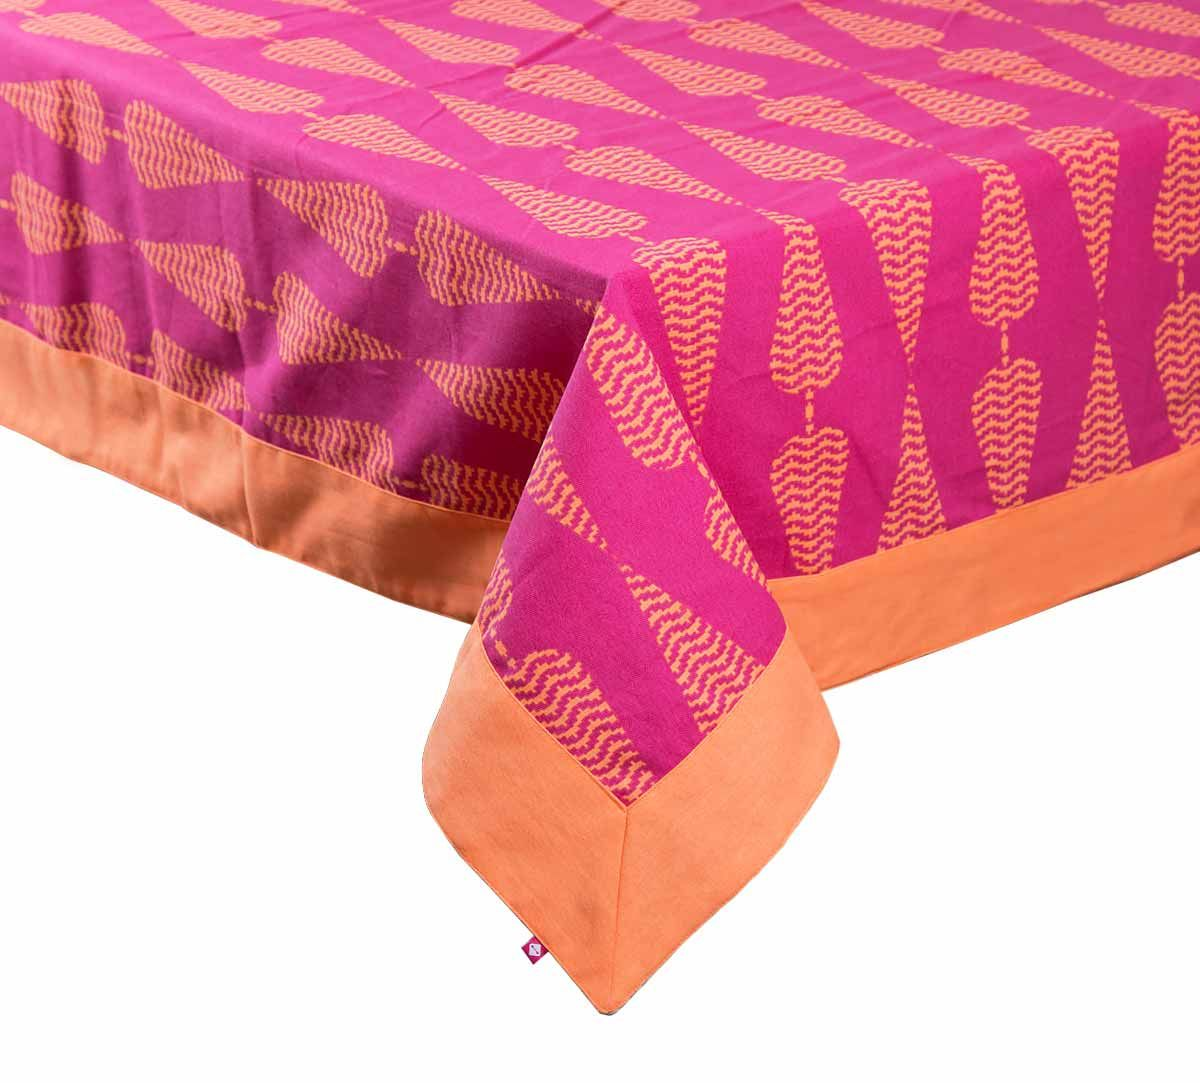 India Circus Conifer Spades Table Cloth